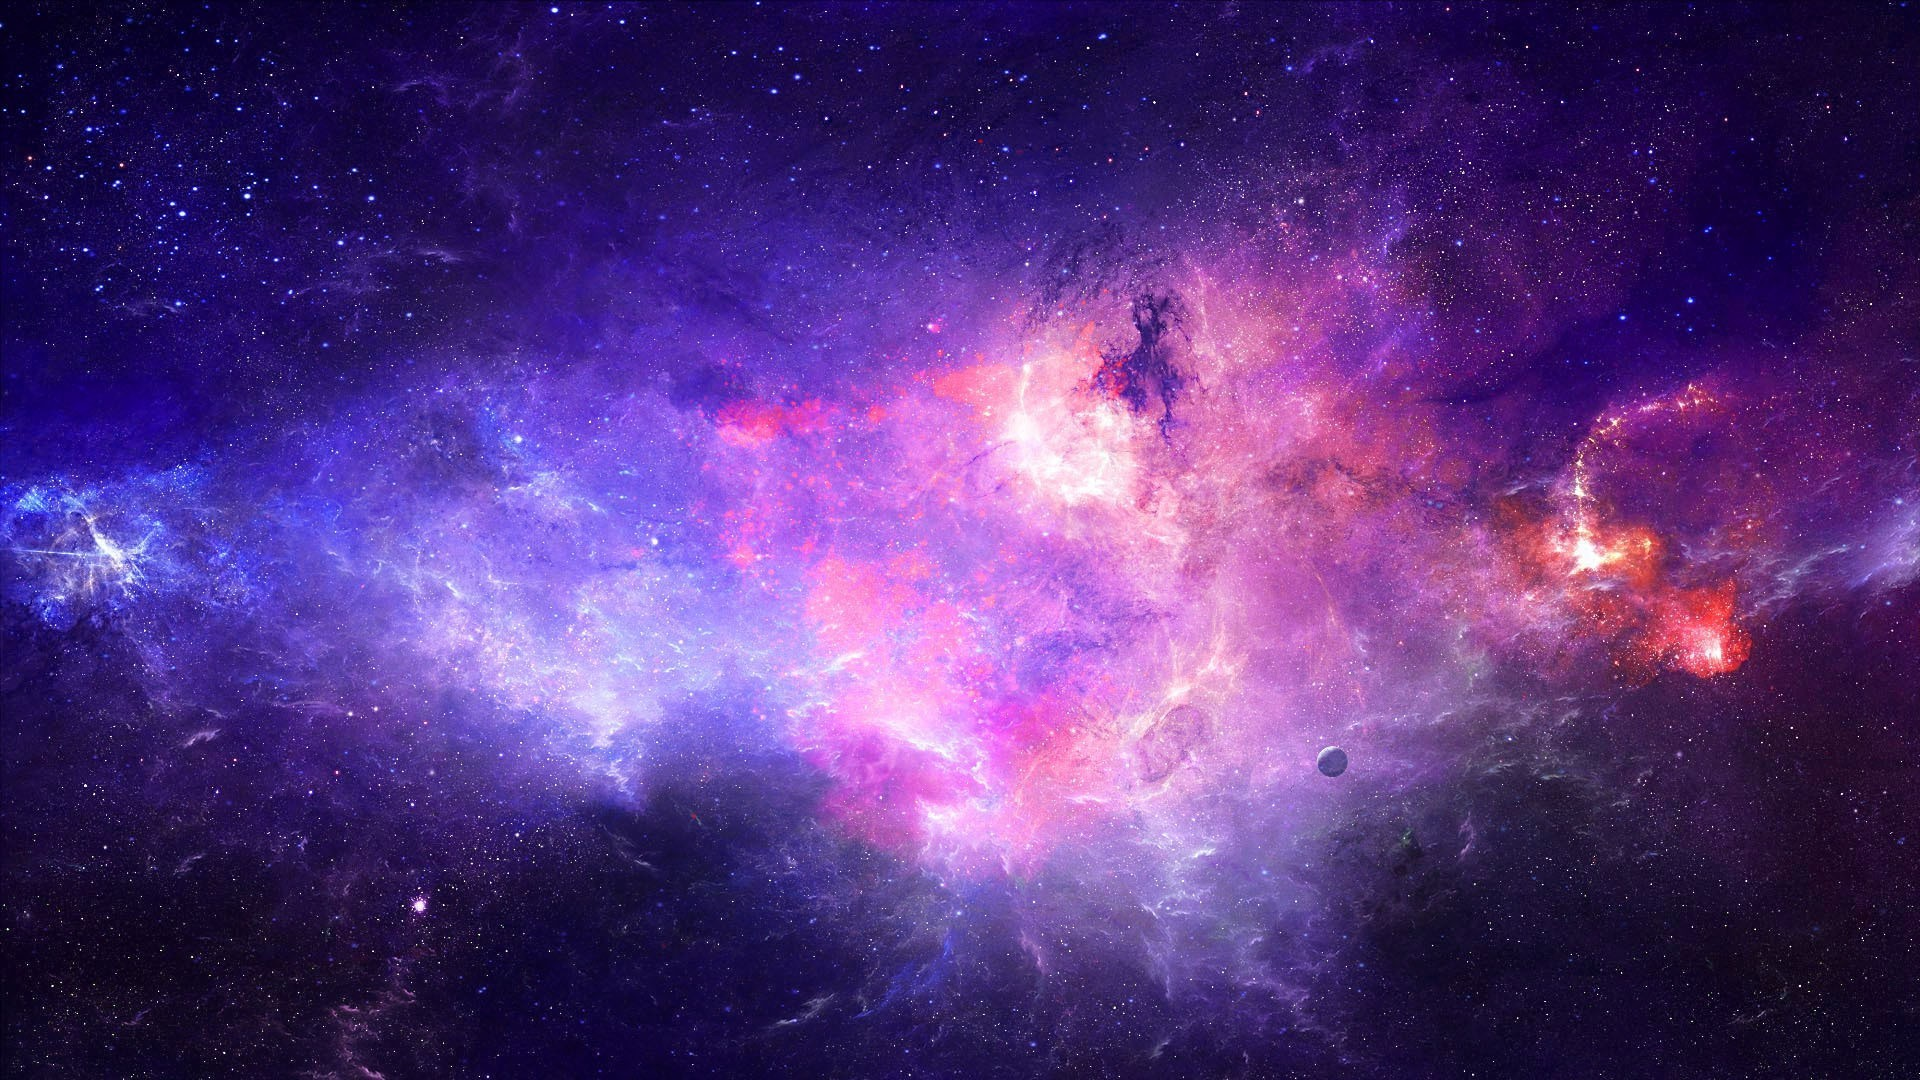 Colorful Galaxy Wallpaper 1080p As Wallpaper HD